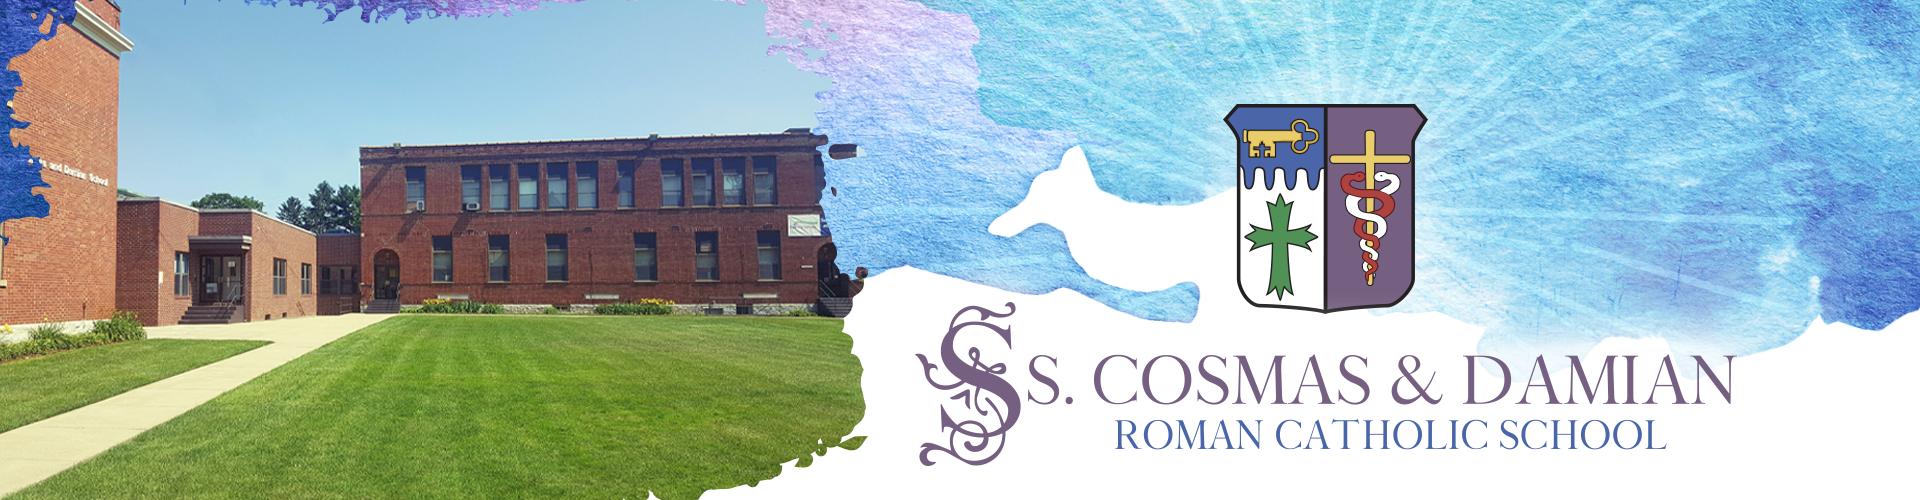 Ss. Cosmas & Damian Catholic School